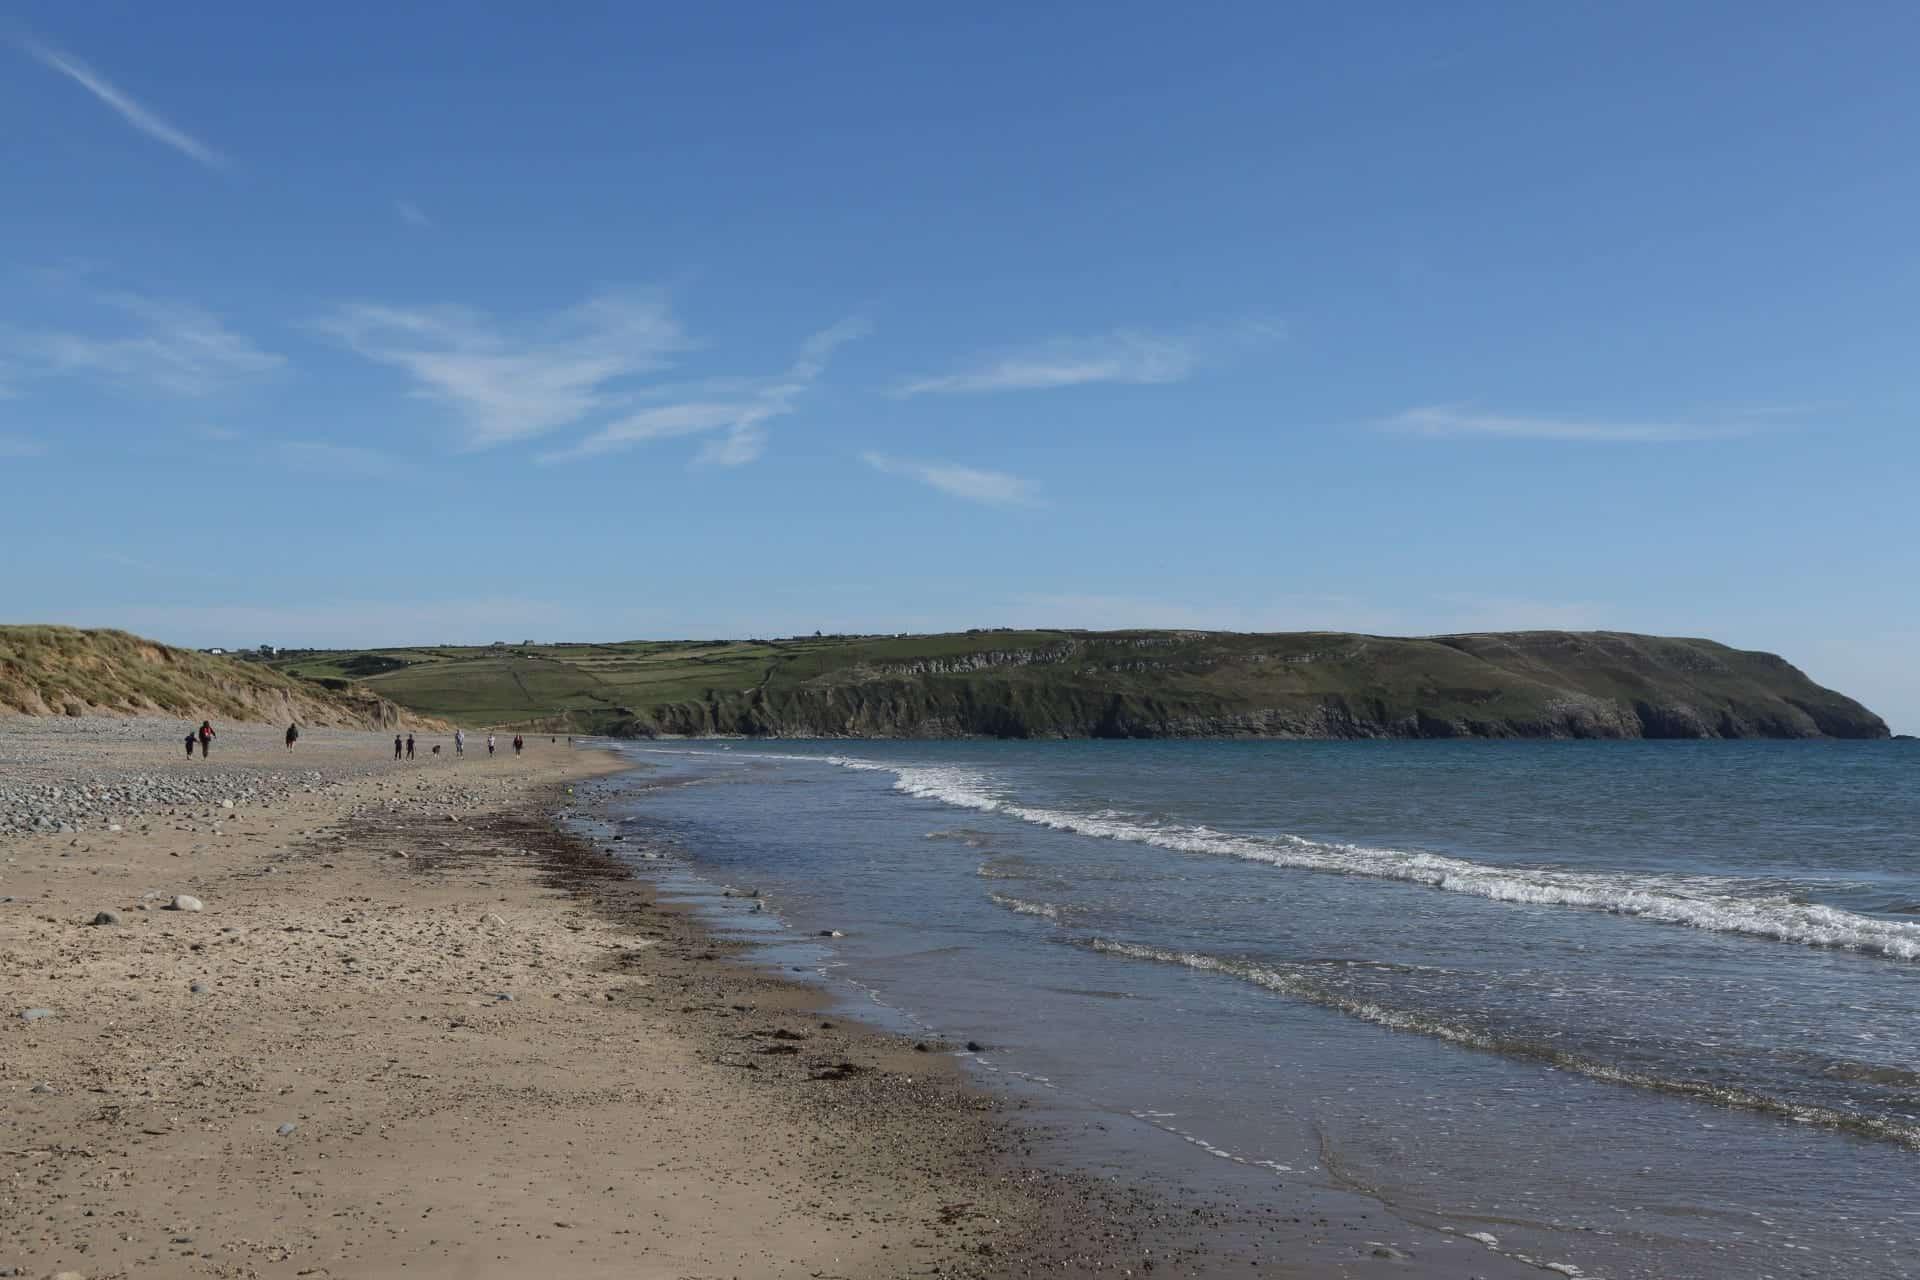 Porth Neigwl Beach in North Wales